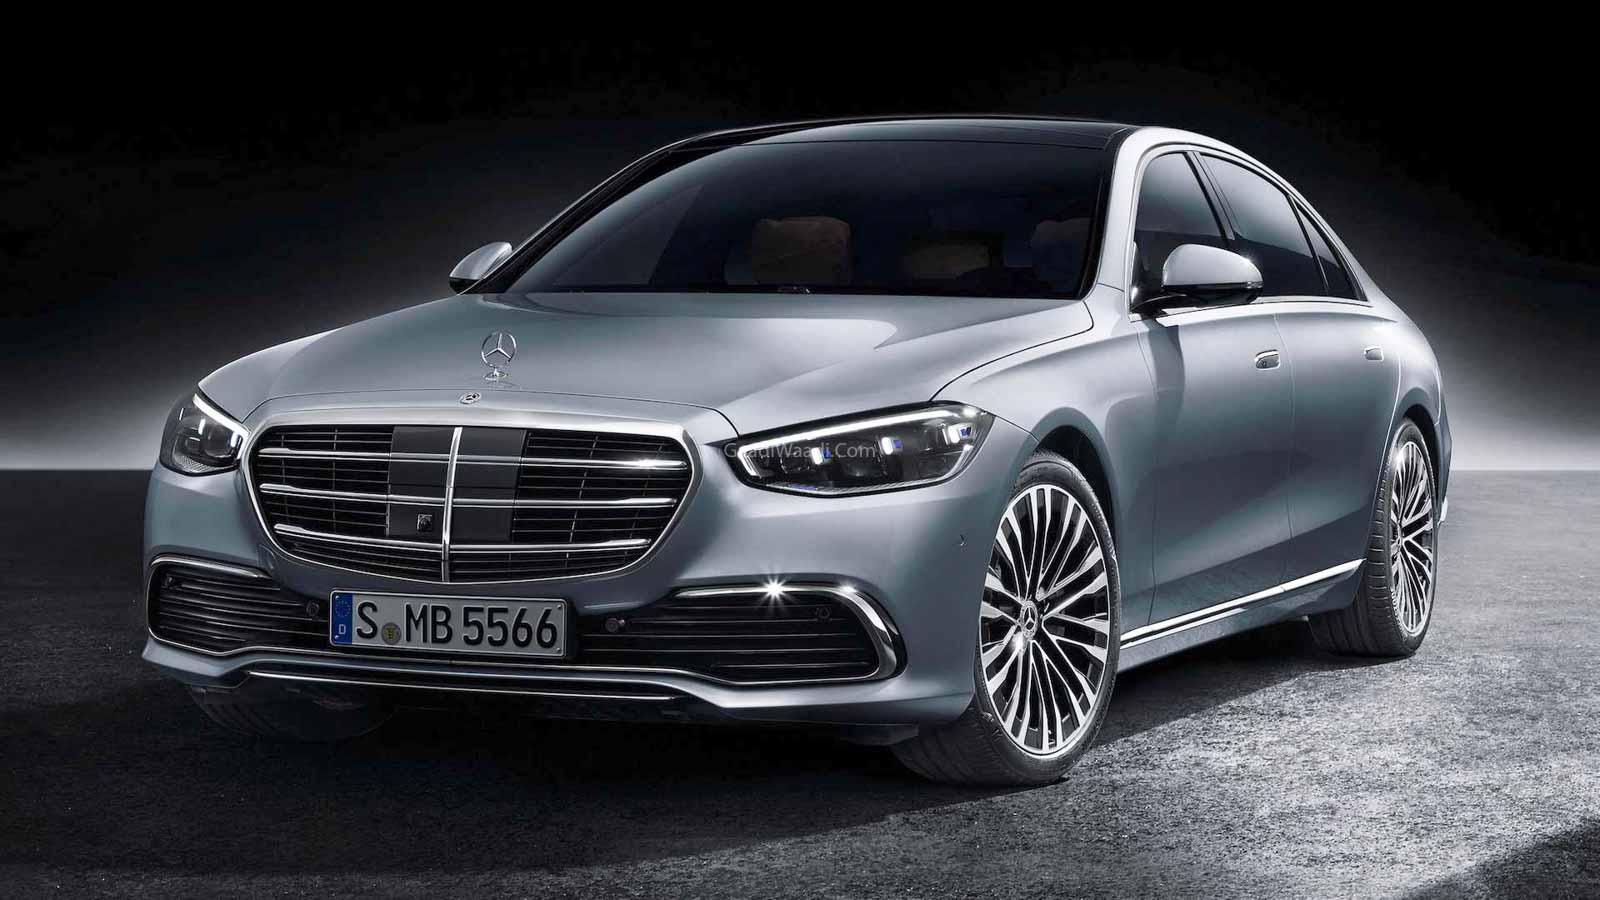 https://gaadiwaadi.com/wp-content/uploads/2020/09/2021-Mercedes-S-Class.jpg